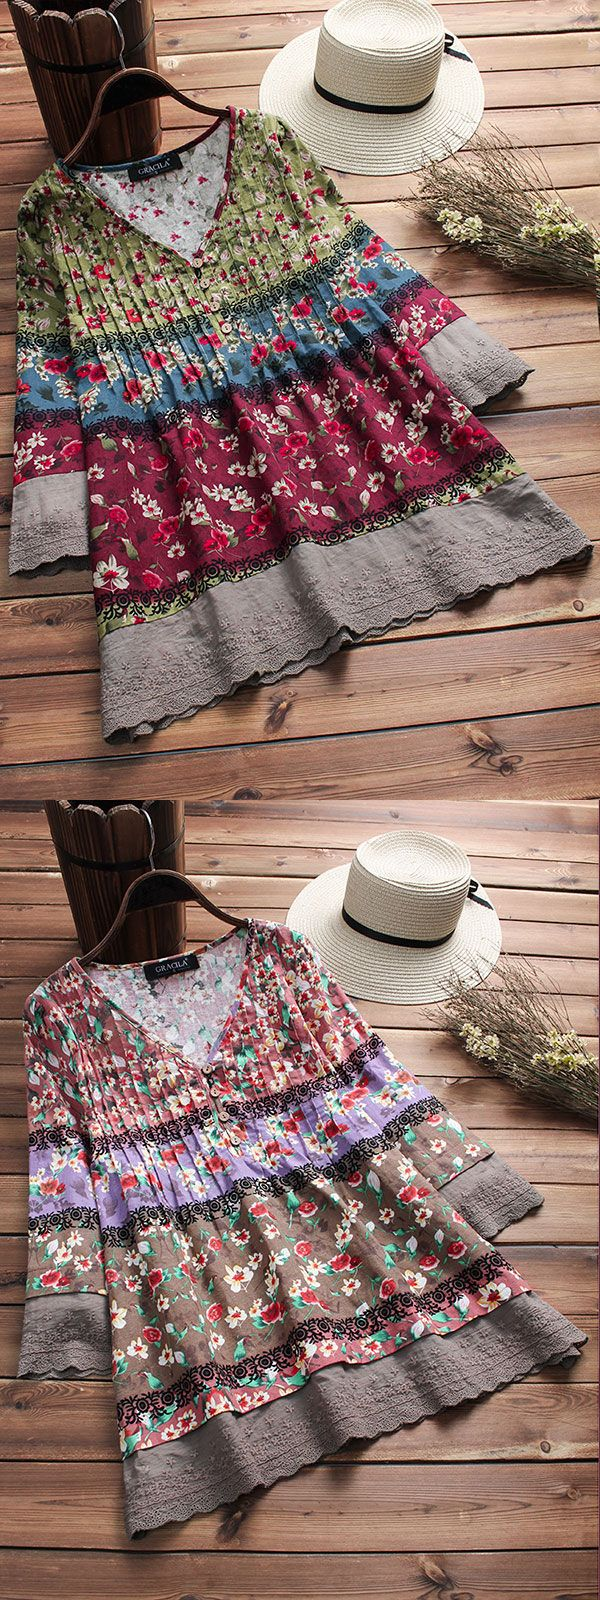 Vintage Floral Print Patchwork 3/4 Sleeve V-neck Blouses For Women. 3 colors opt…